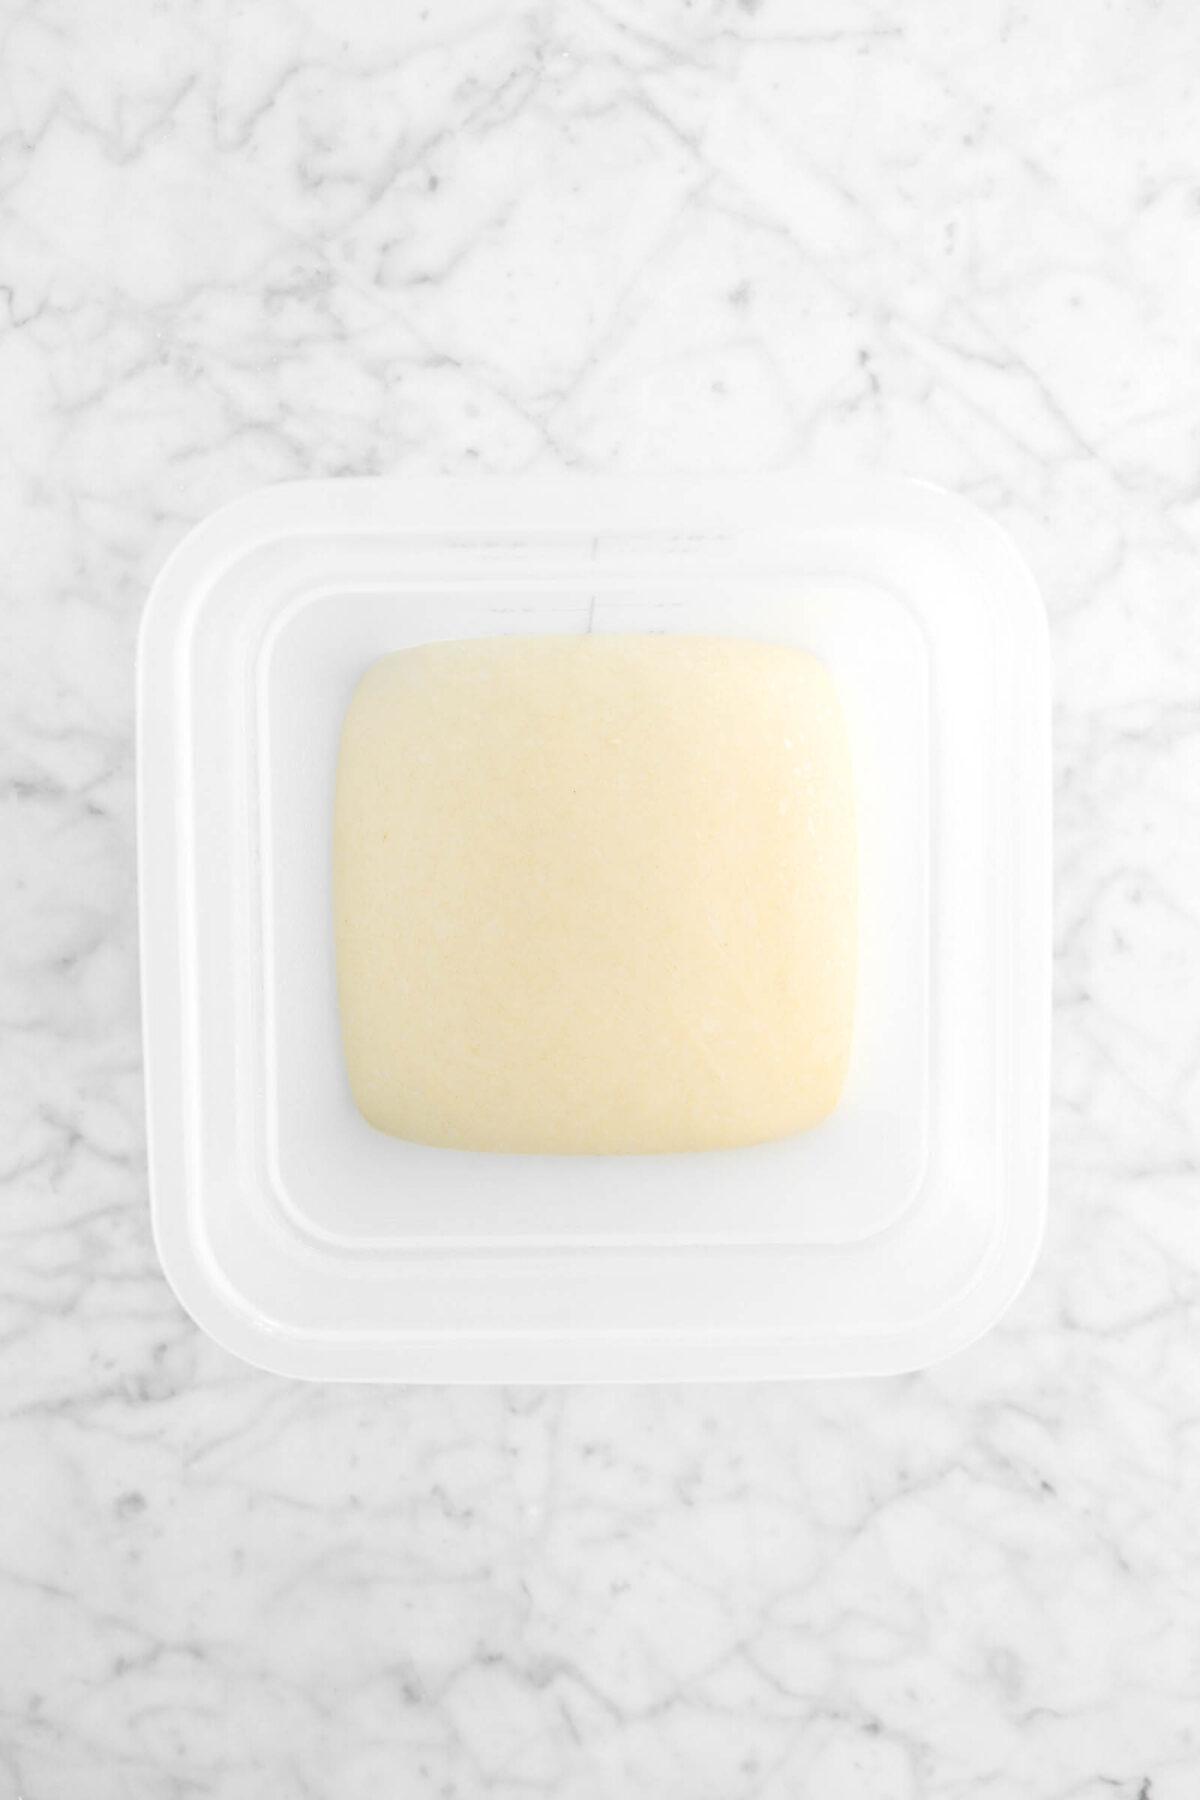 dough doubled in bulk in plastic bucket